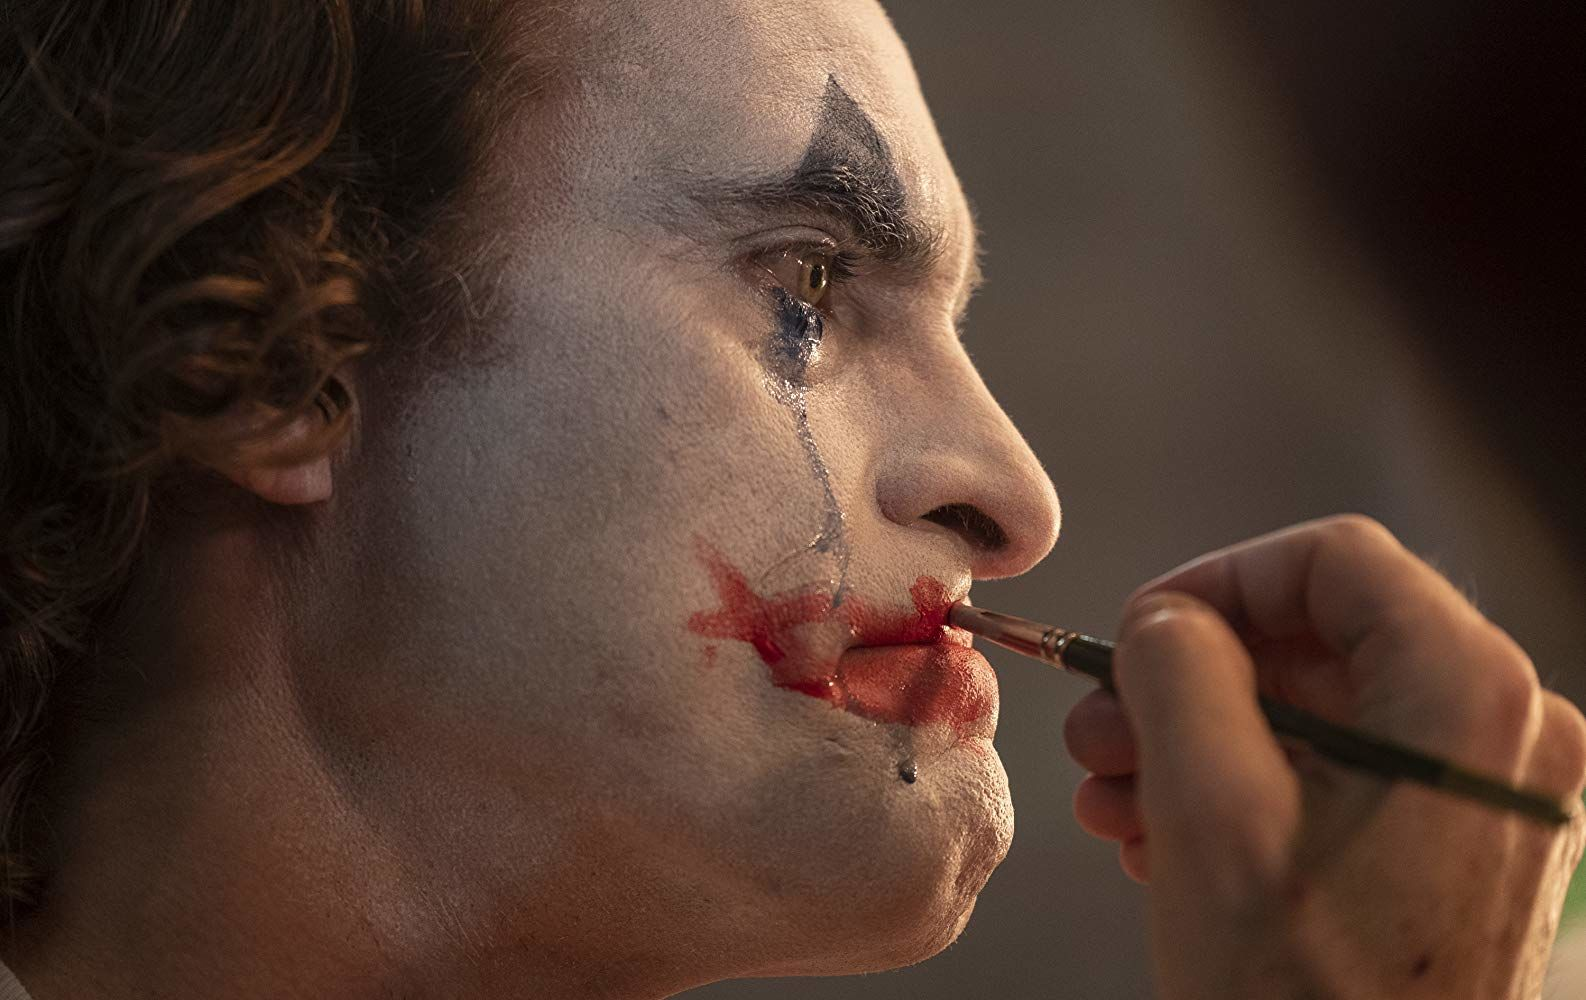 Telan Korban Jiwa, Pemuda Ini Akhiri Hidupnya Setelah Tonton Joker